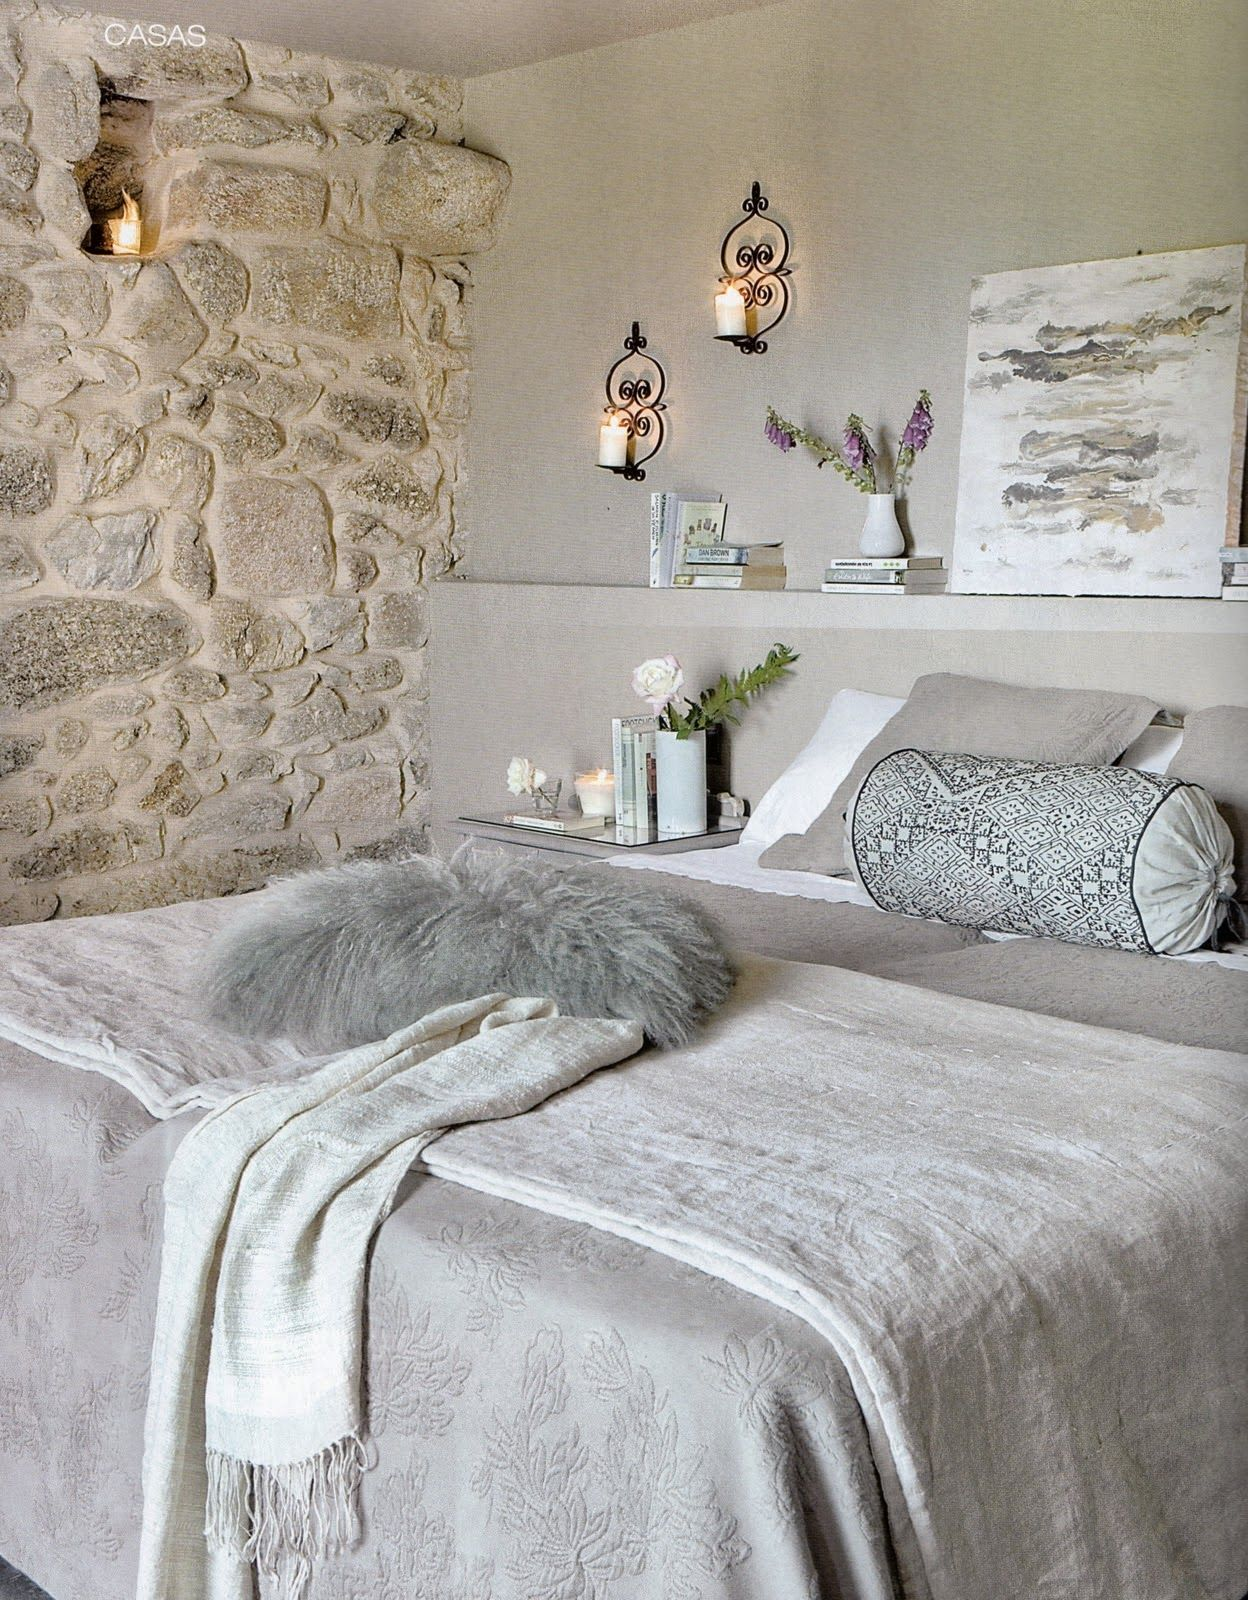 Pingl Par Beatriz L Pez De La Cerda Sur Bedroom Pinterest